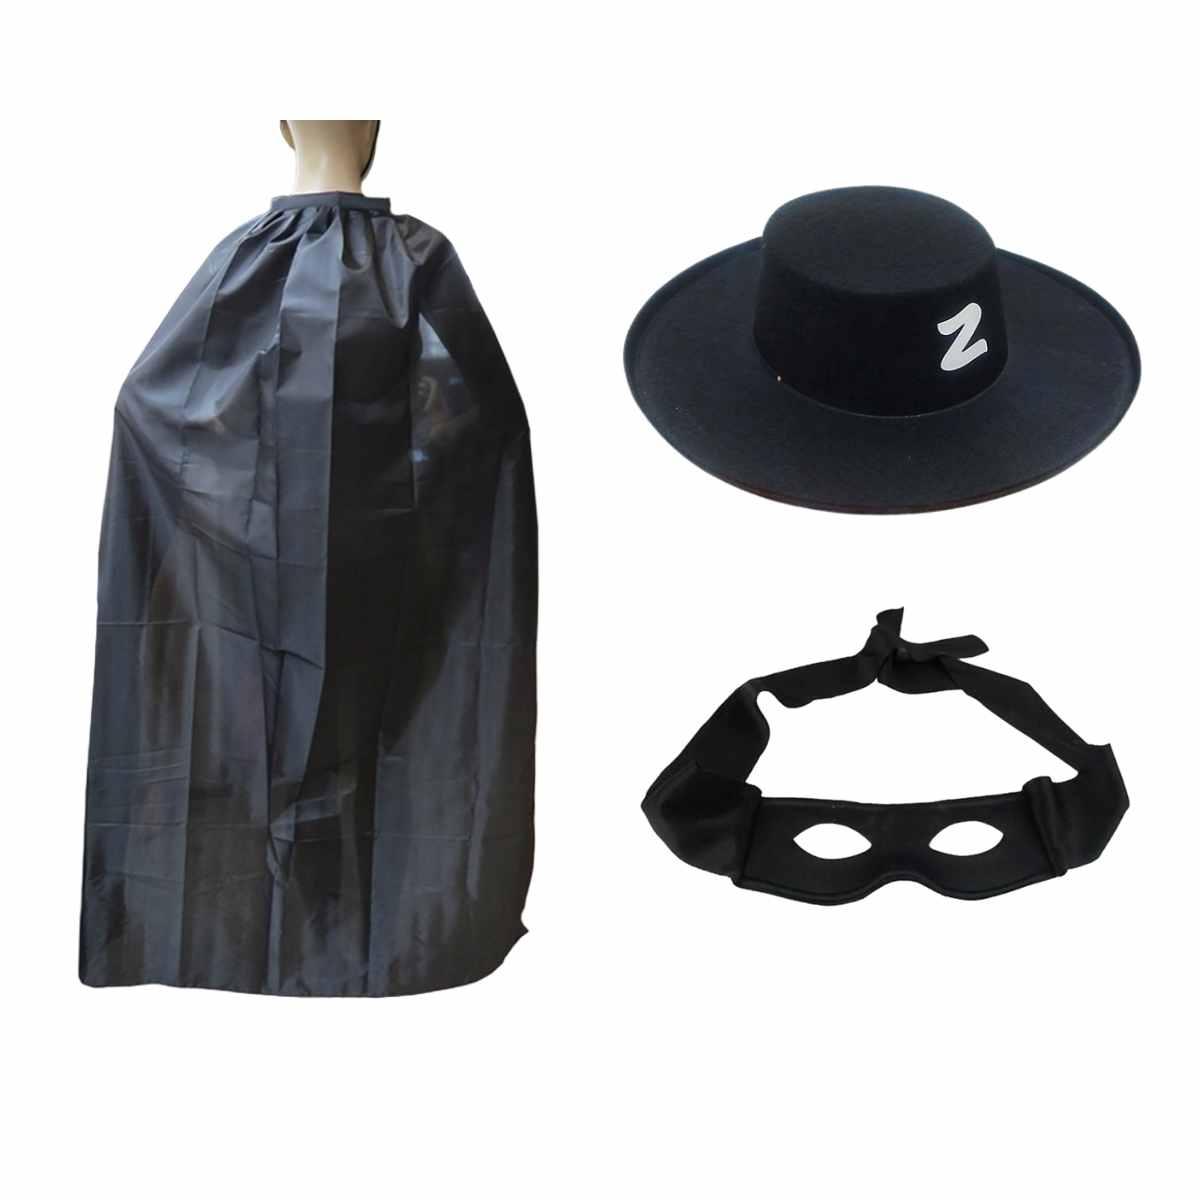 Kit Zorro (Máscara, Capa, Chapéu)